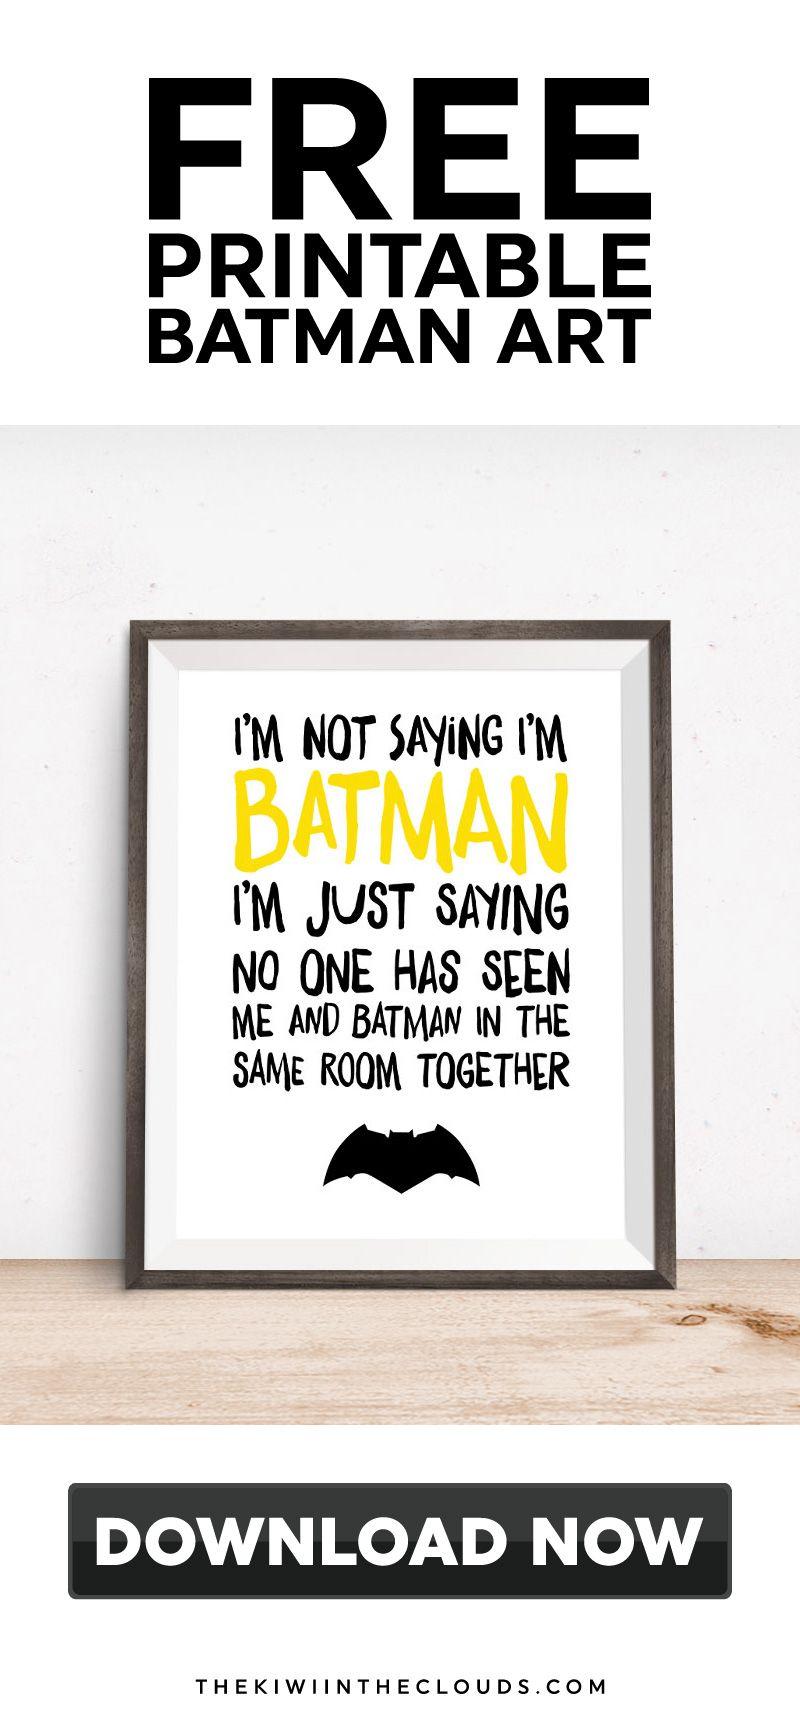 How To Make A Modern Batman Boys Room He Ll Love Spending